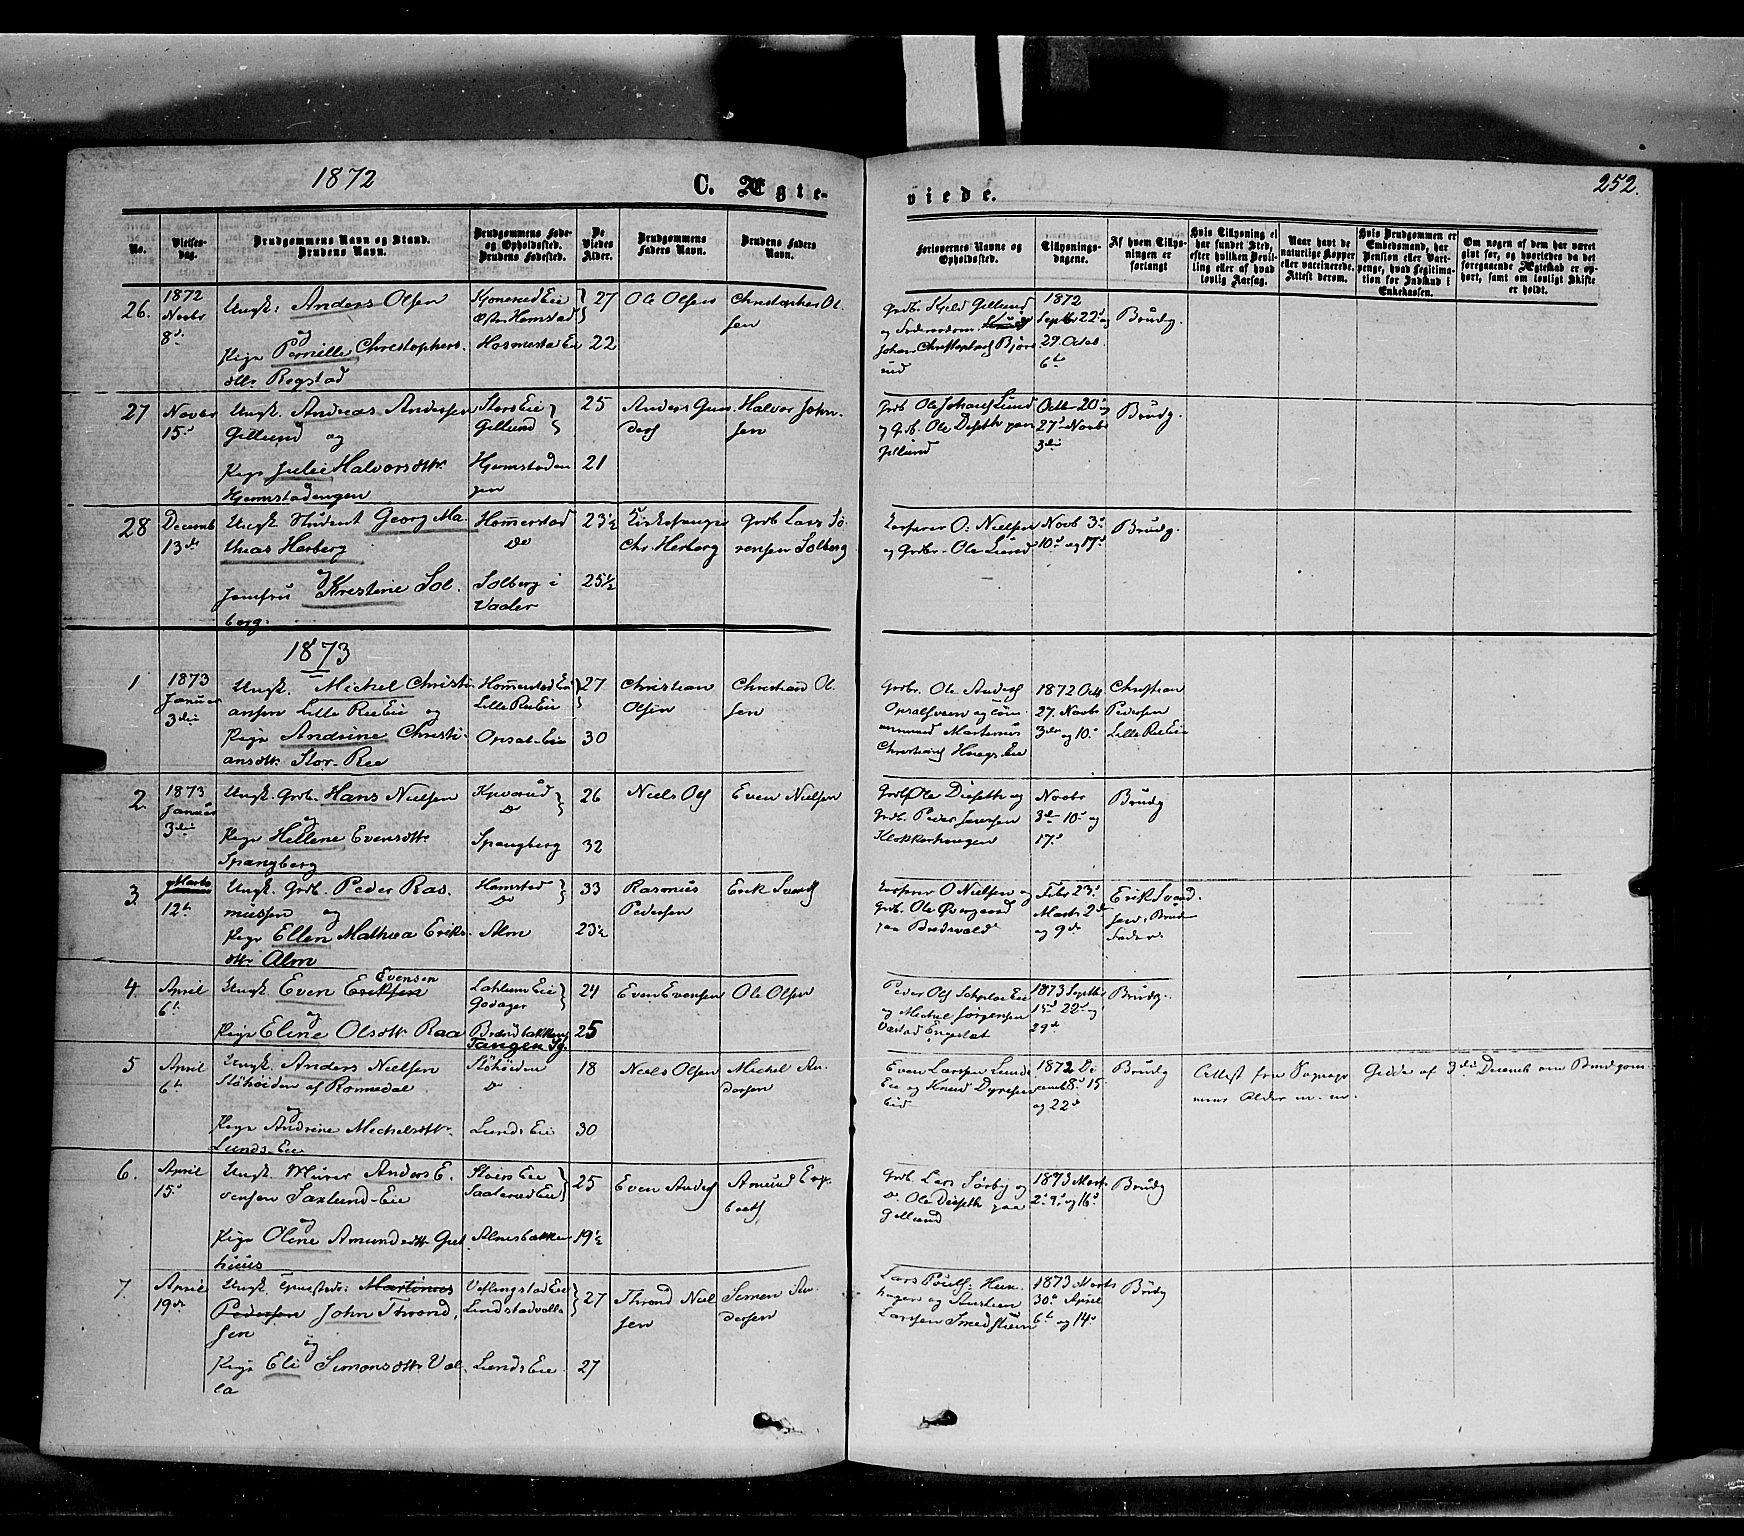 SAH, Stange prestekontor, K/L0013: Ministerialbok nr. 13, 1862-1879, s. 252